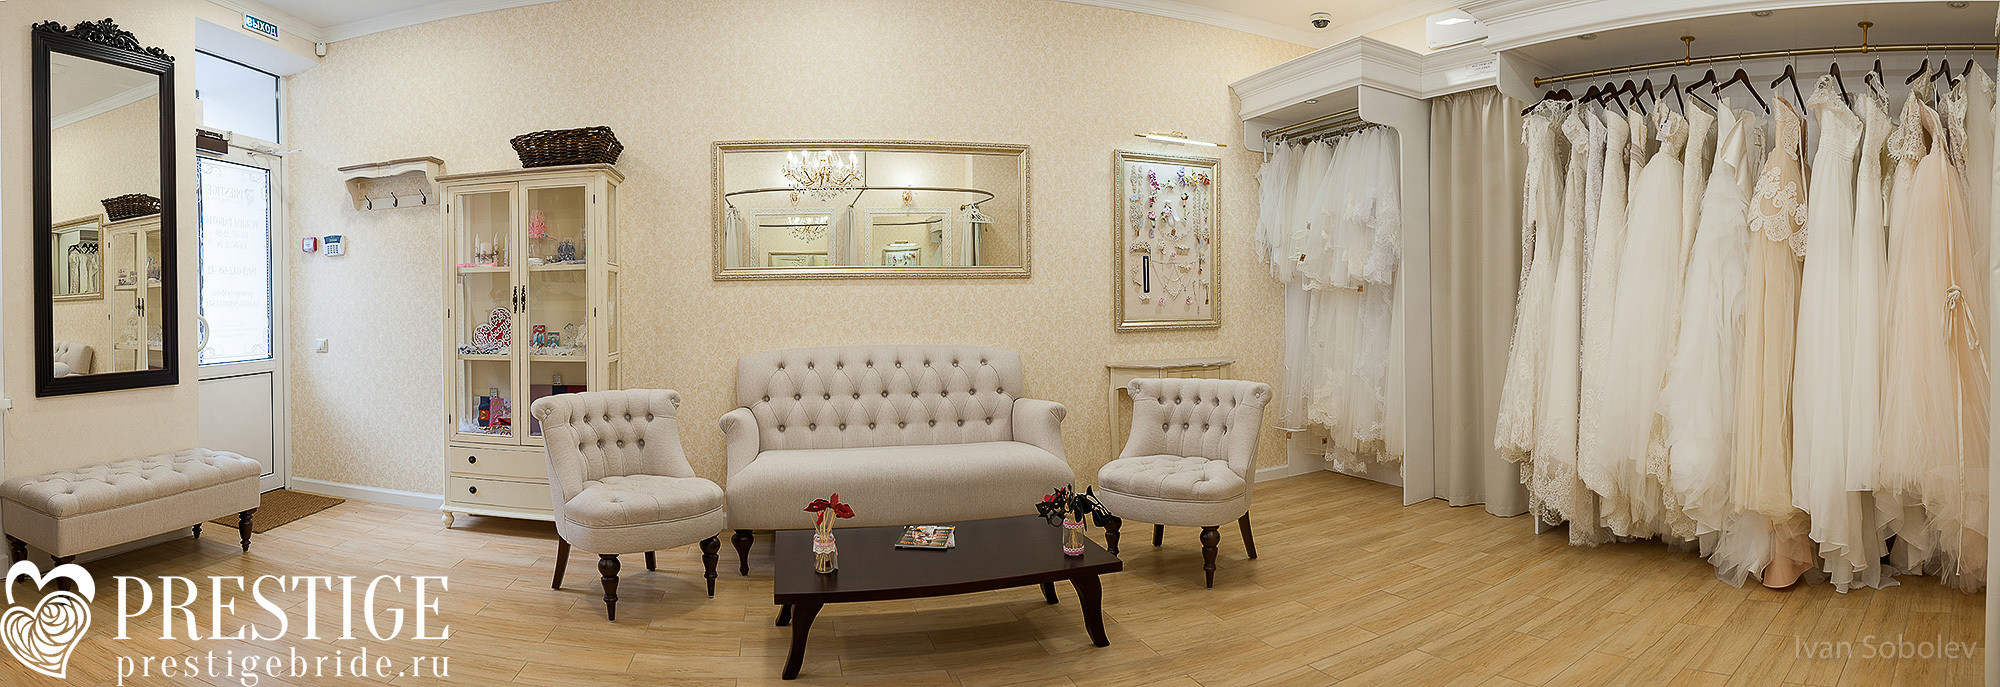 Свадебный салон Prestige